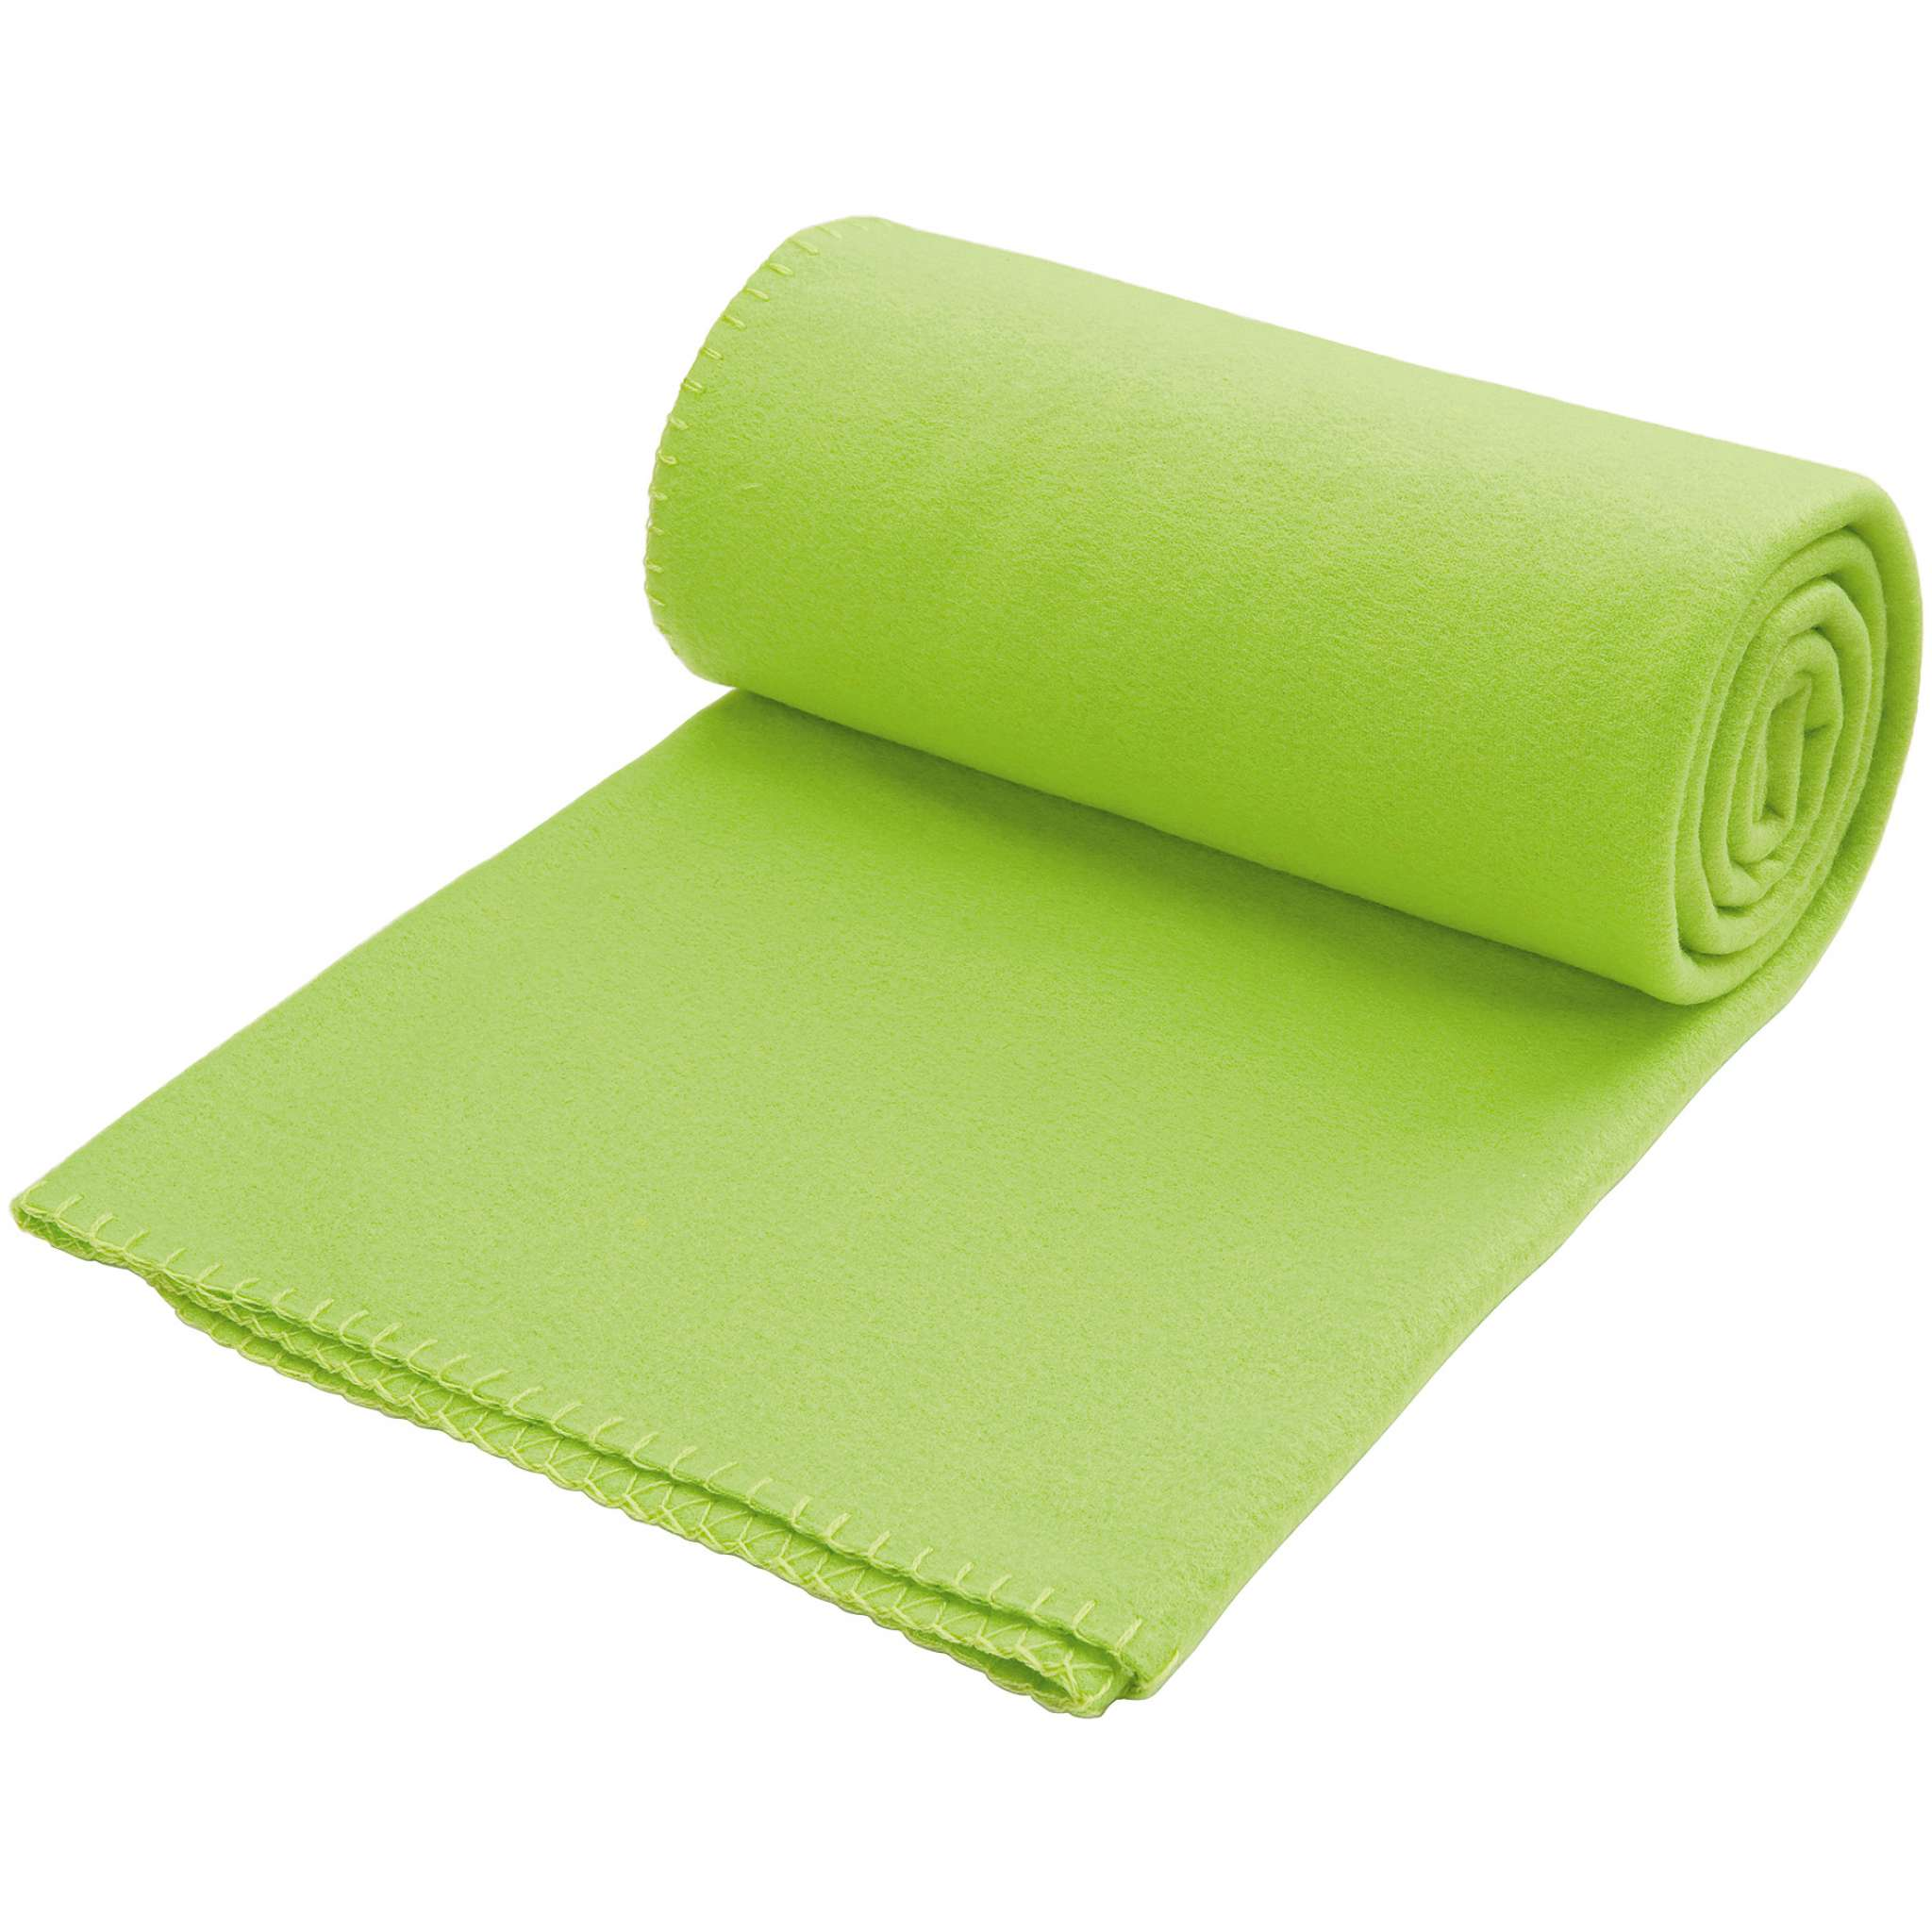 Fleecepledd Solid (150x180 cm)-Limegrønn (#CAD151)